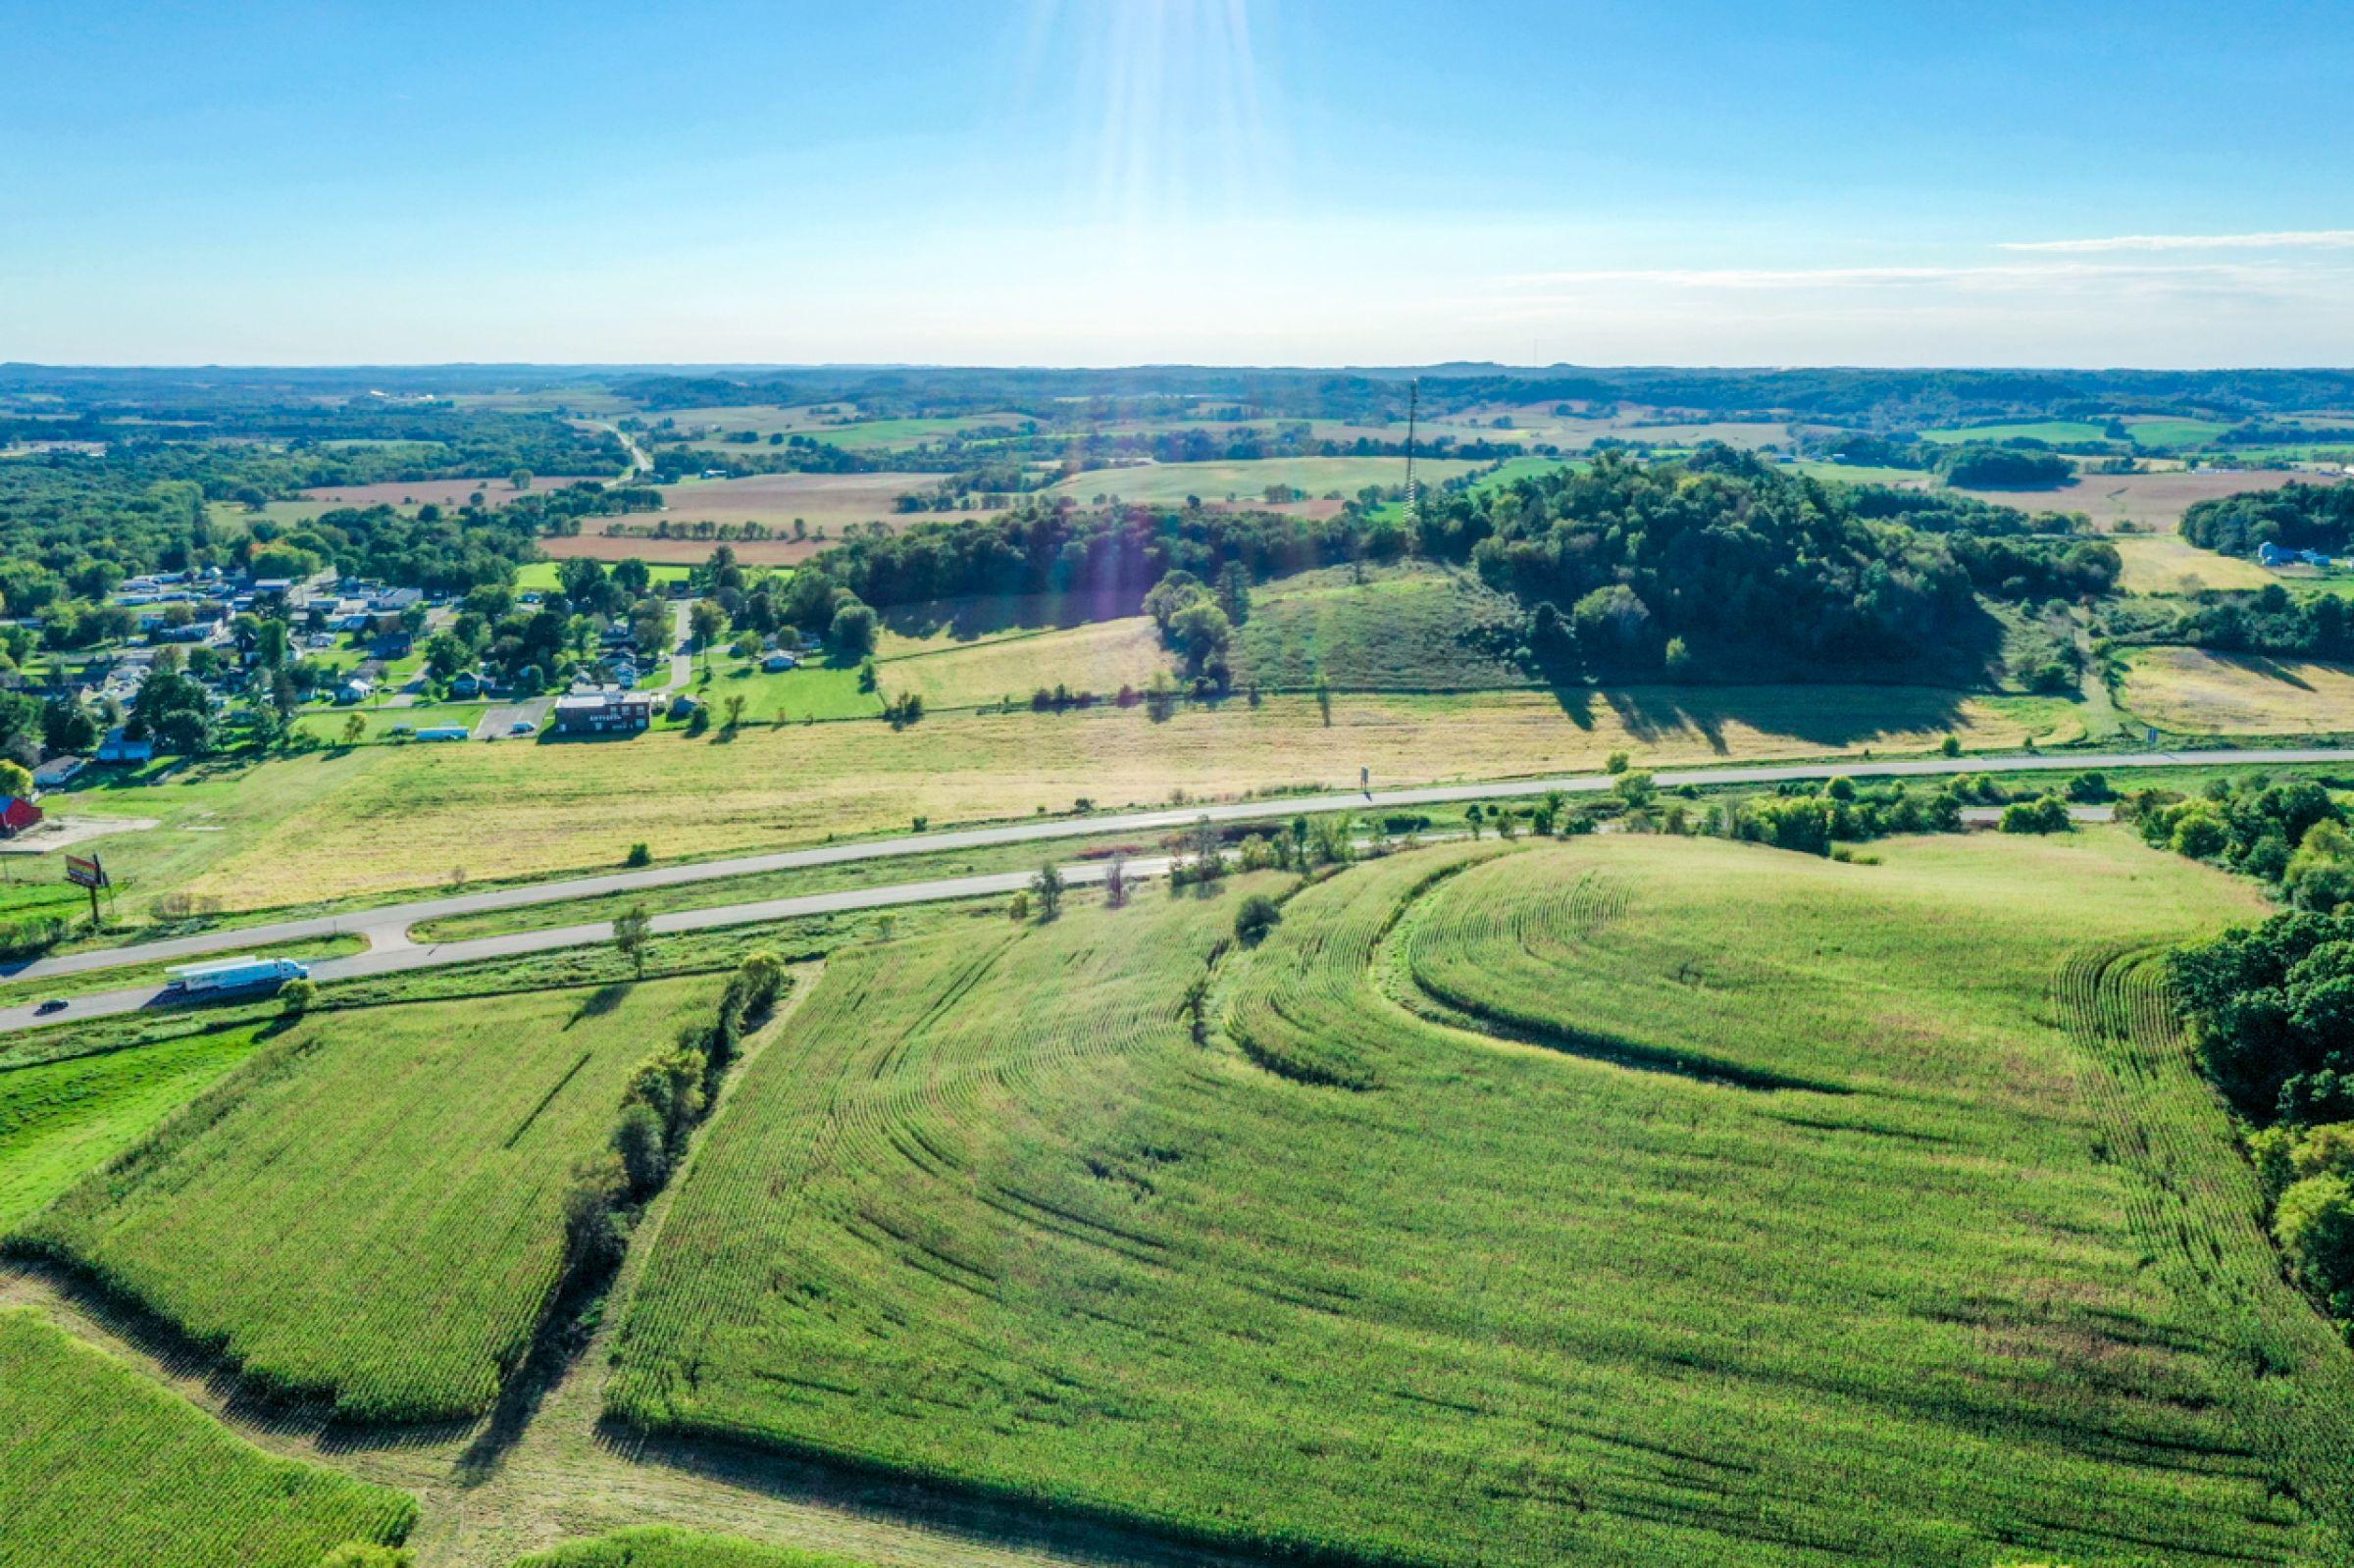 2-4449-acres-ml-3rd-street-hixton-54635-2-2021-09-16-164939.jpg